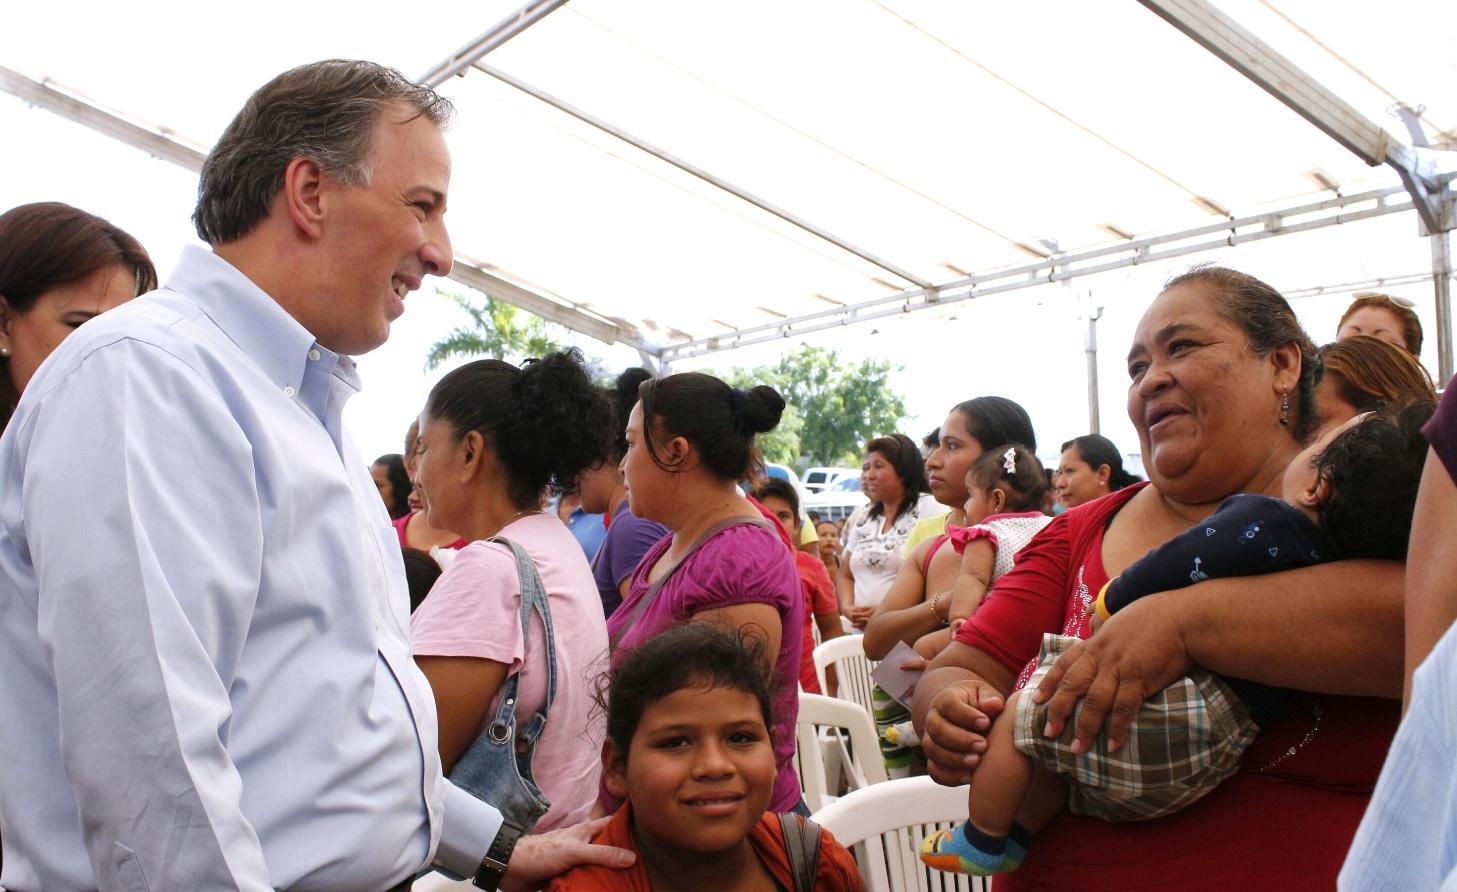 FOTO 2 Gira del secretario Meade en Tamaulipasjpg